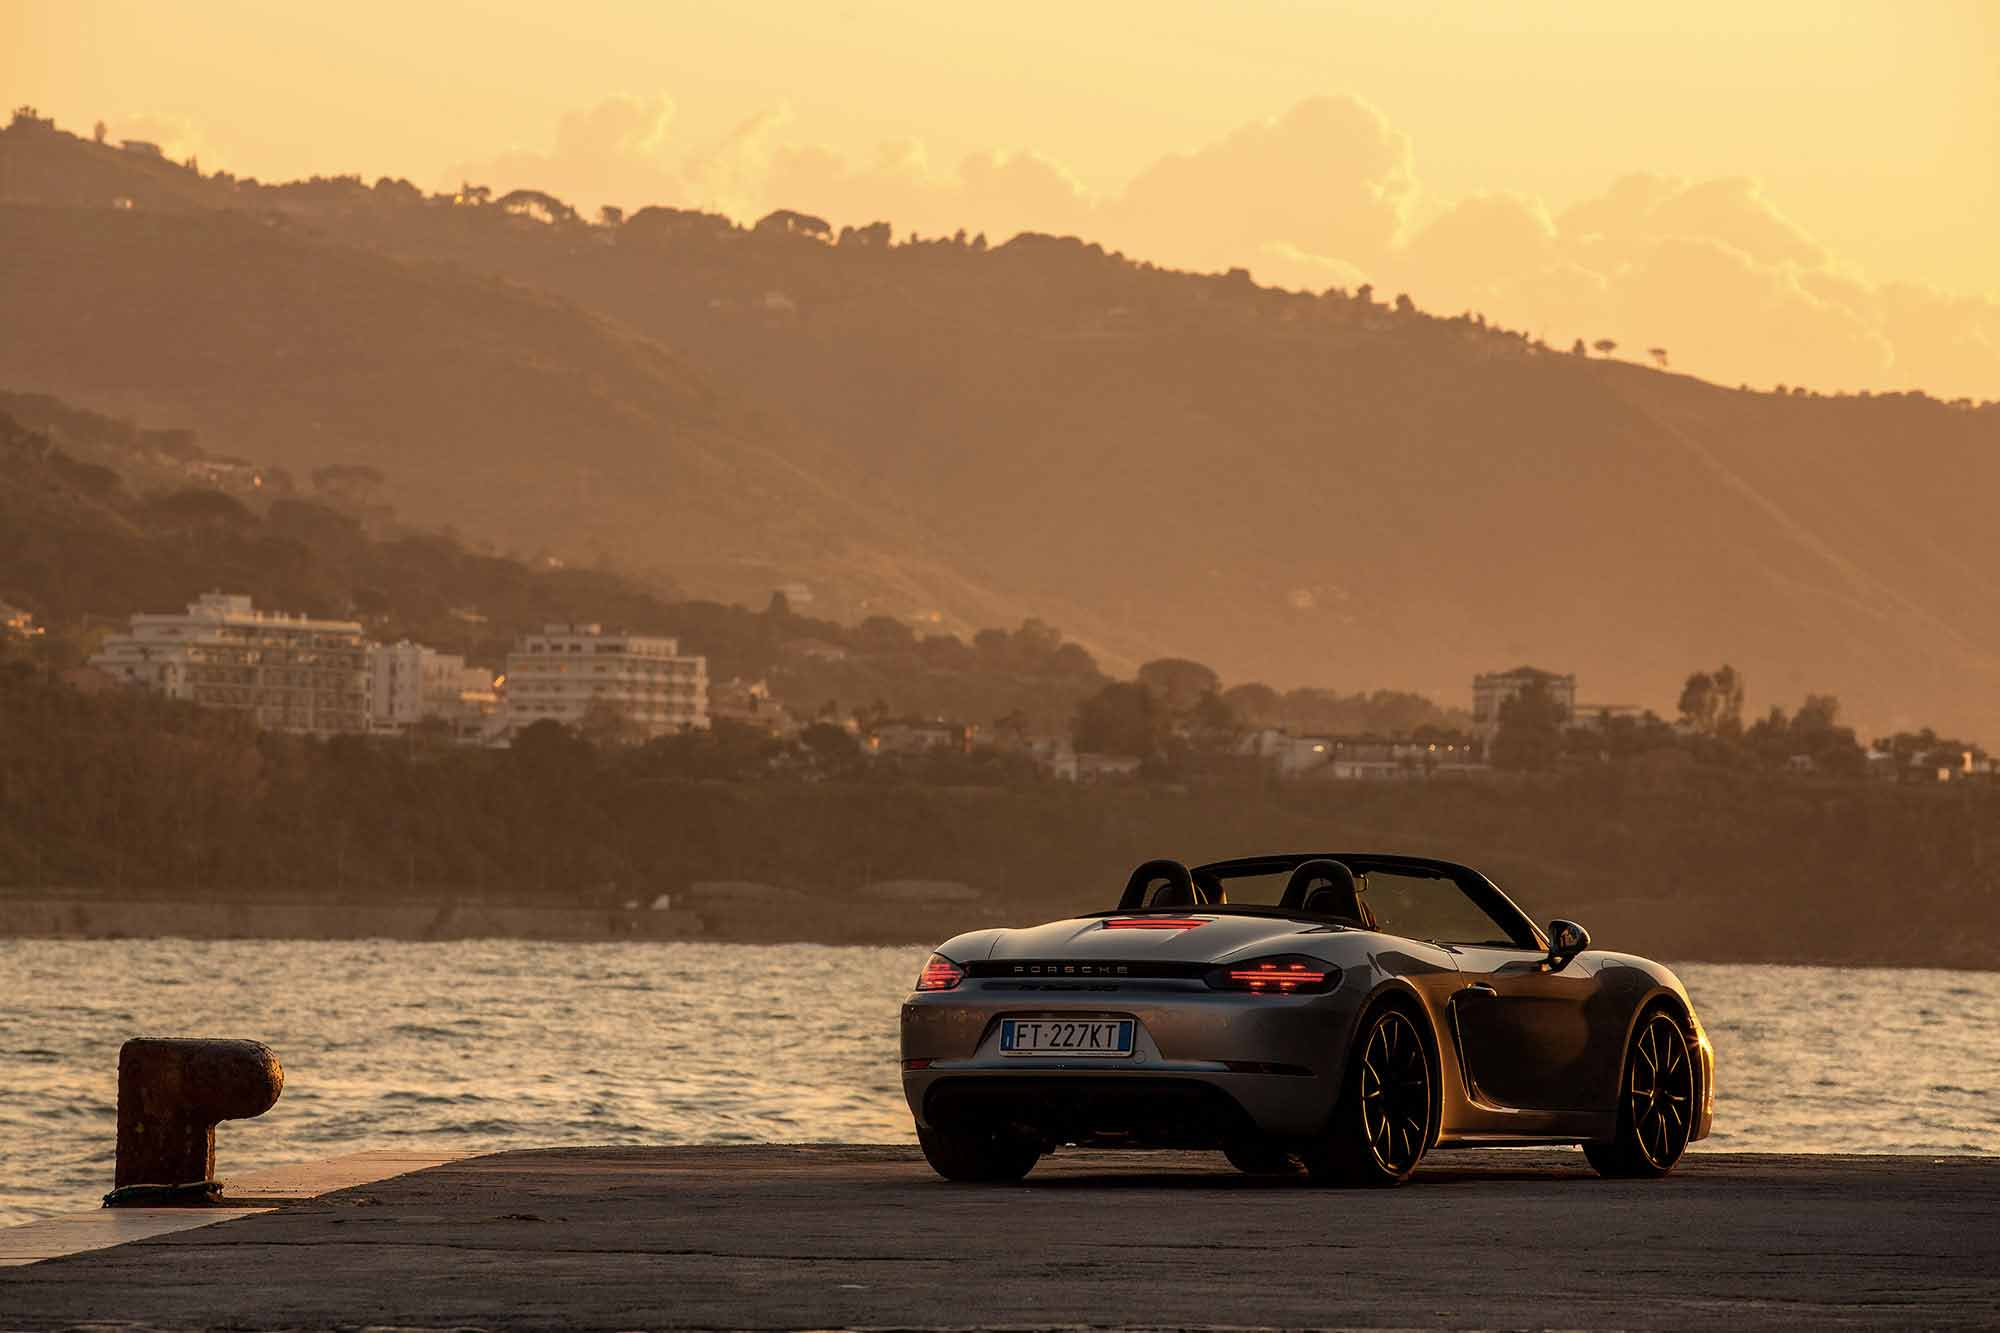 Porsche al Tramonto